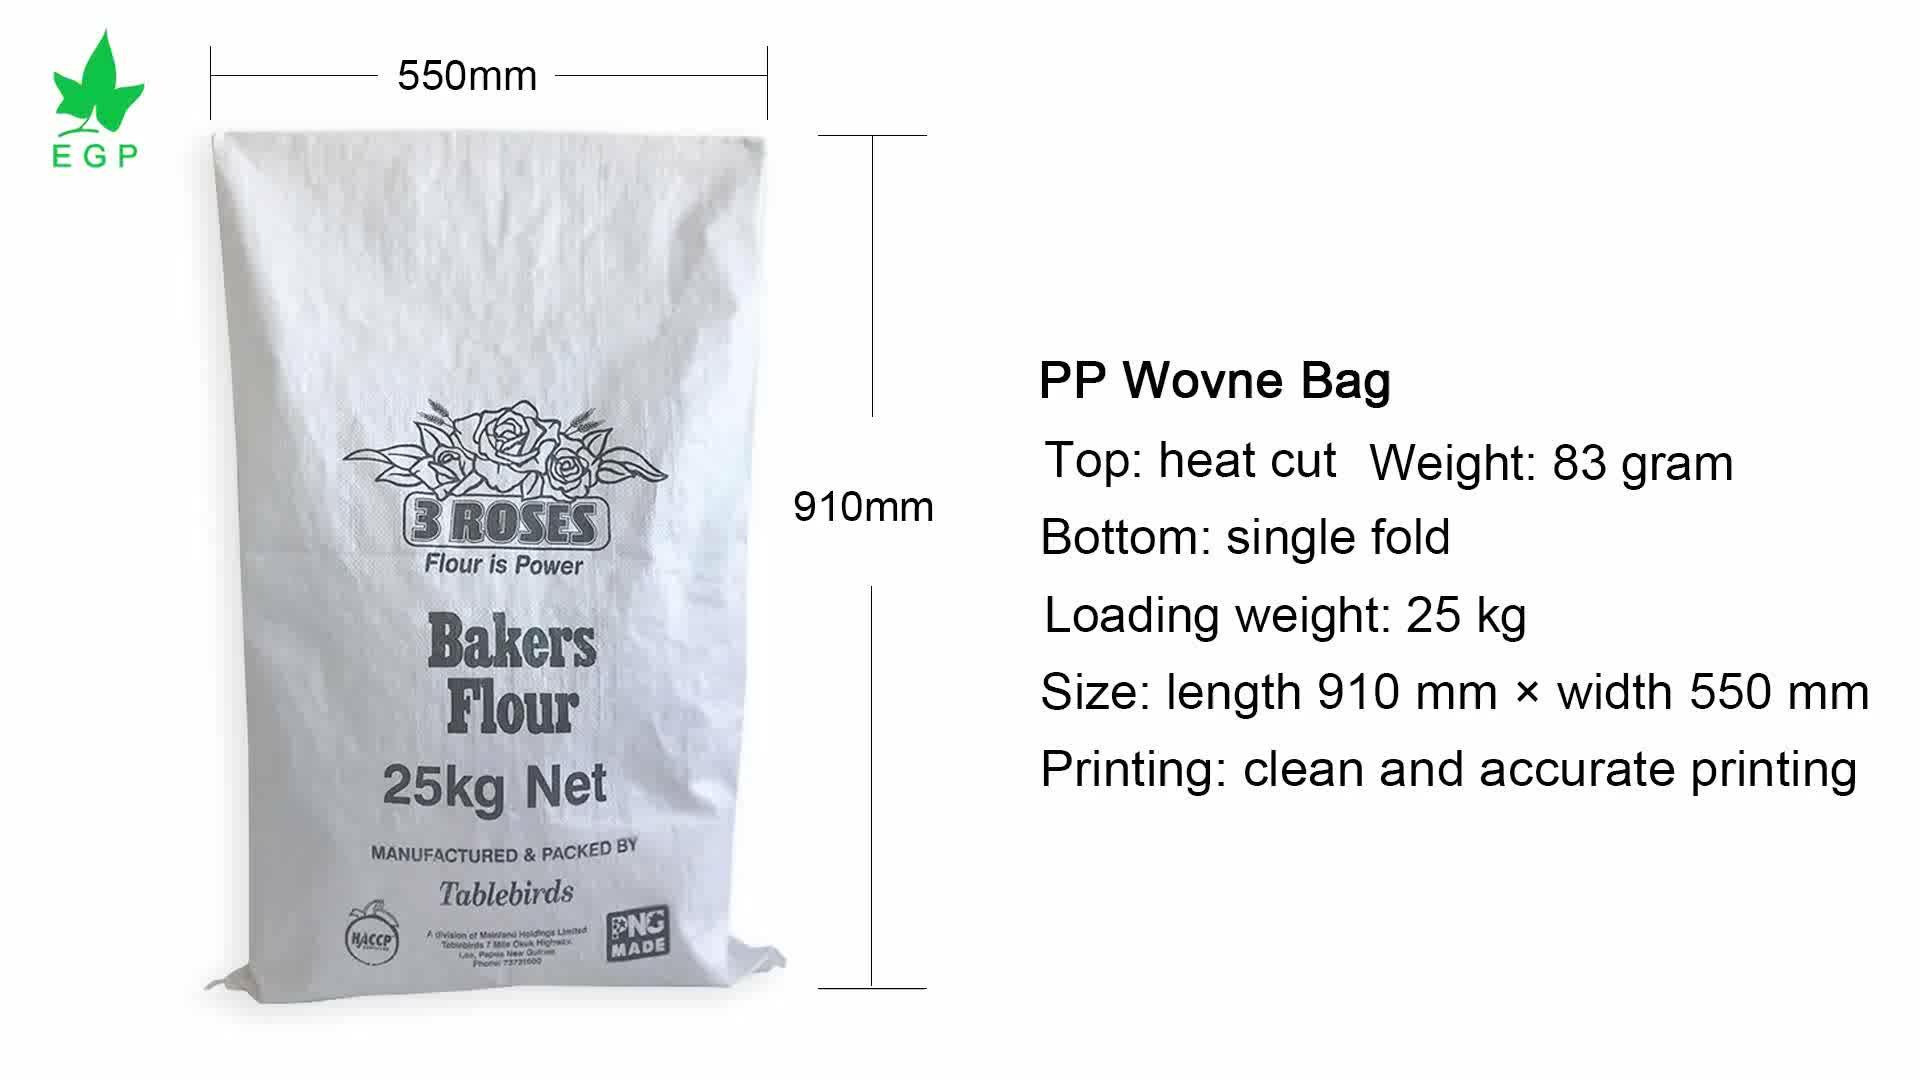 EGP PWB-4 Polypropylene सफेद आटा पैकेजिंग बोरियों पीपी बुना बैग 10 kg 25 kg 50 kg